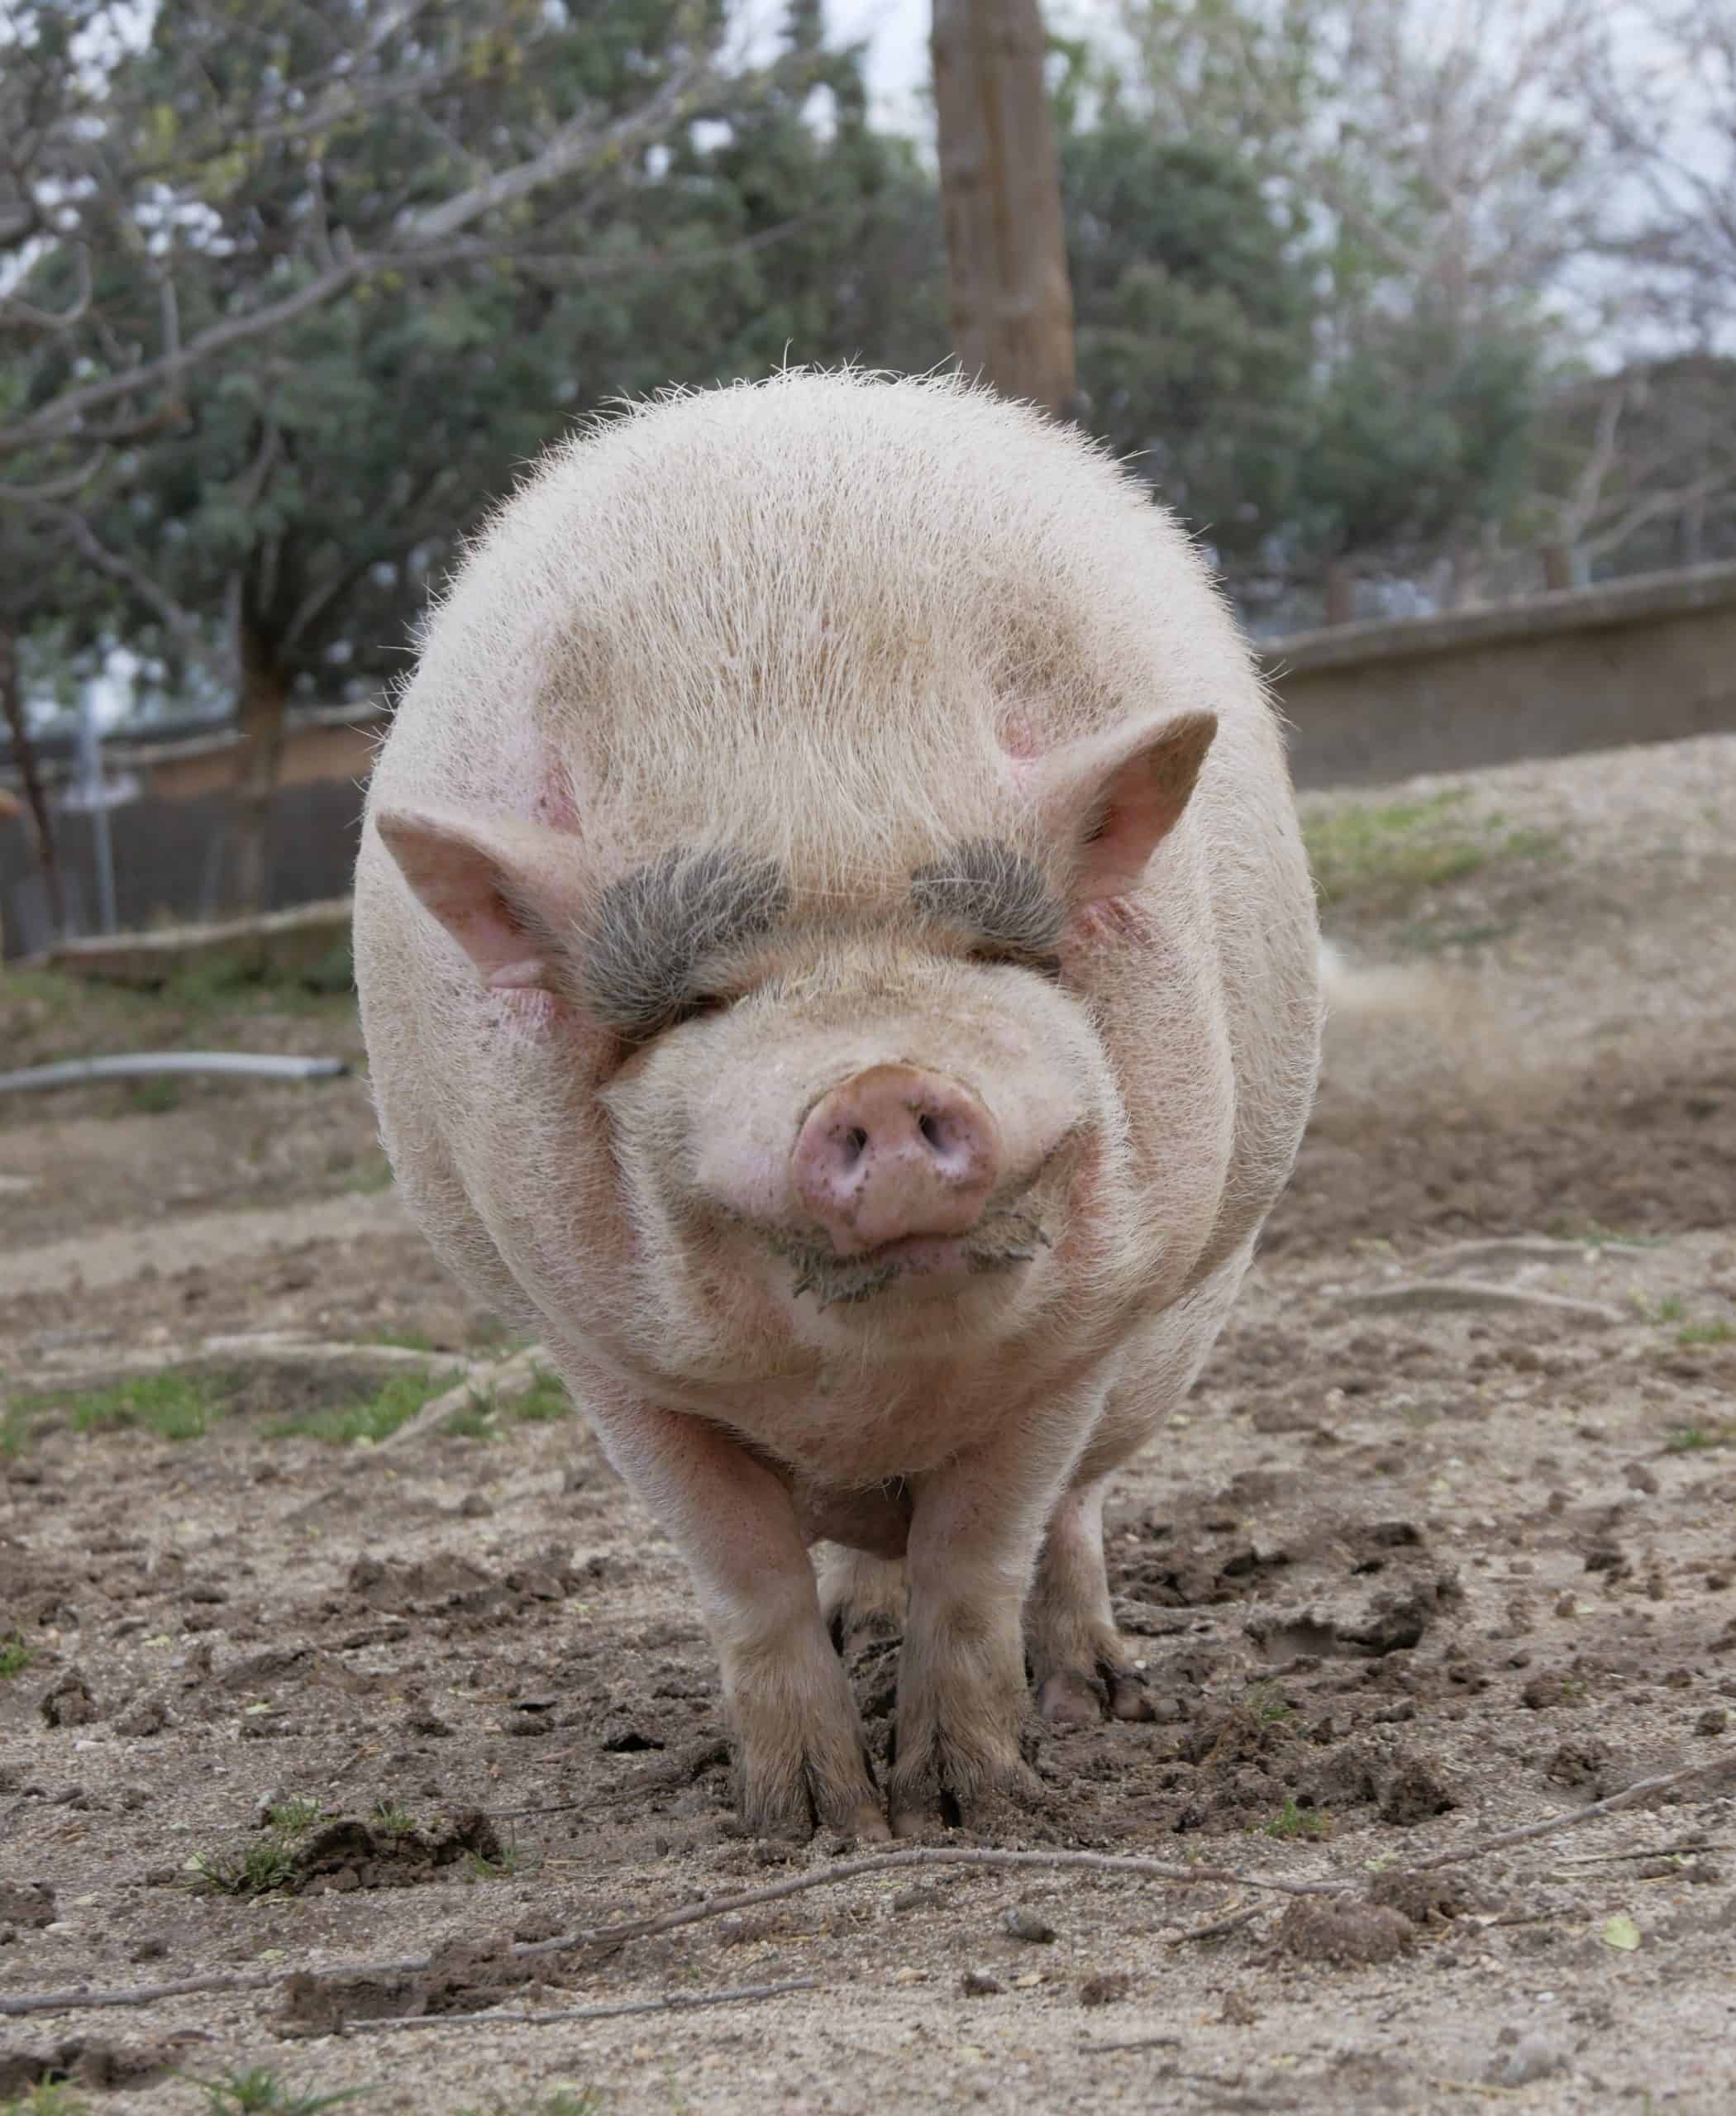 Apadrina cerdo Enriquito